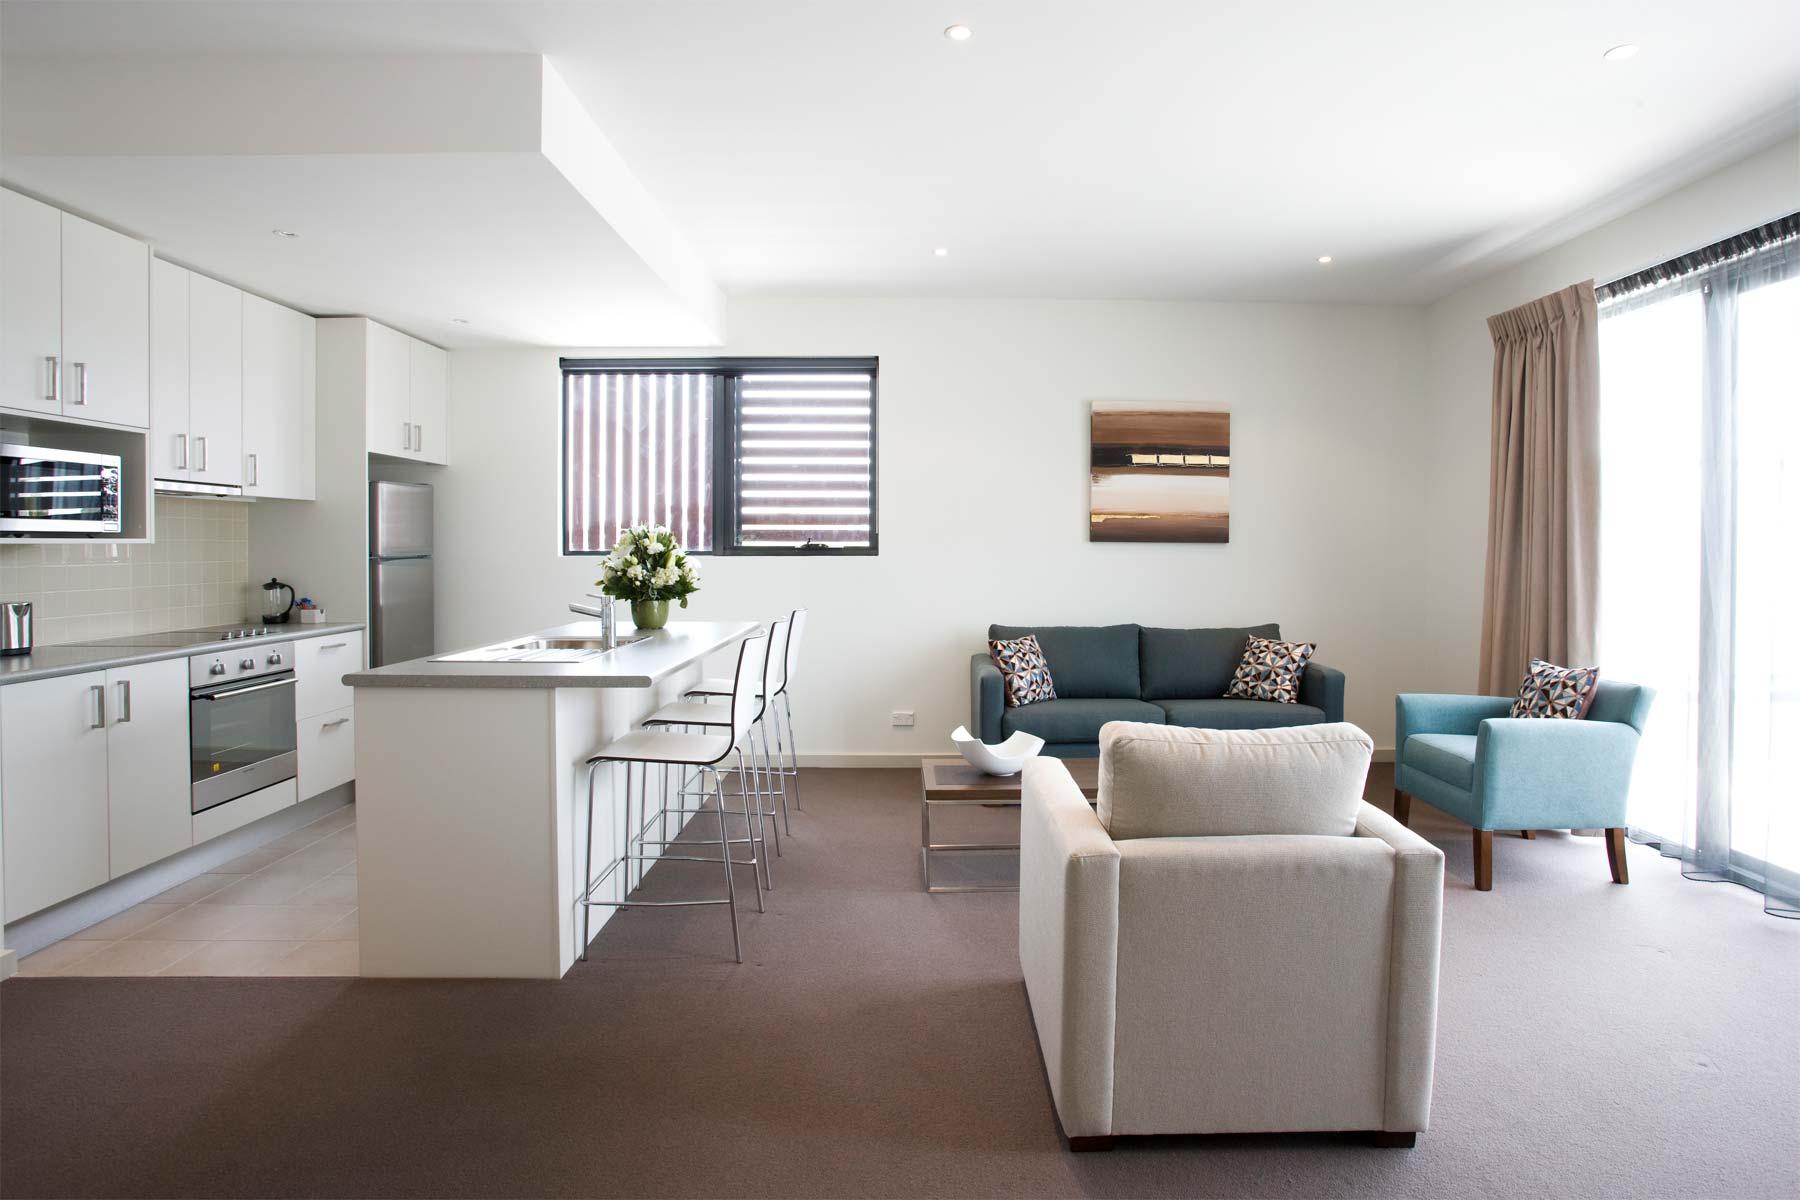 Modern Apartments Design modern apartment interior - home design